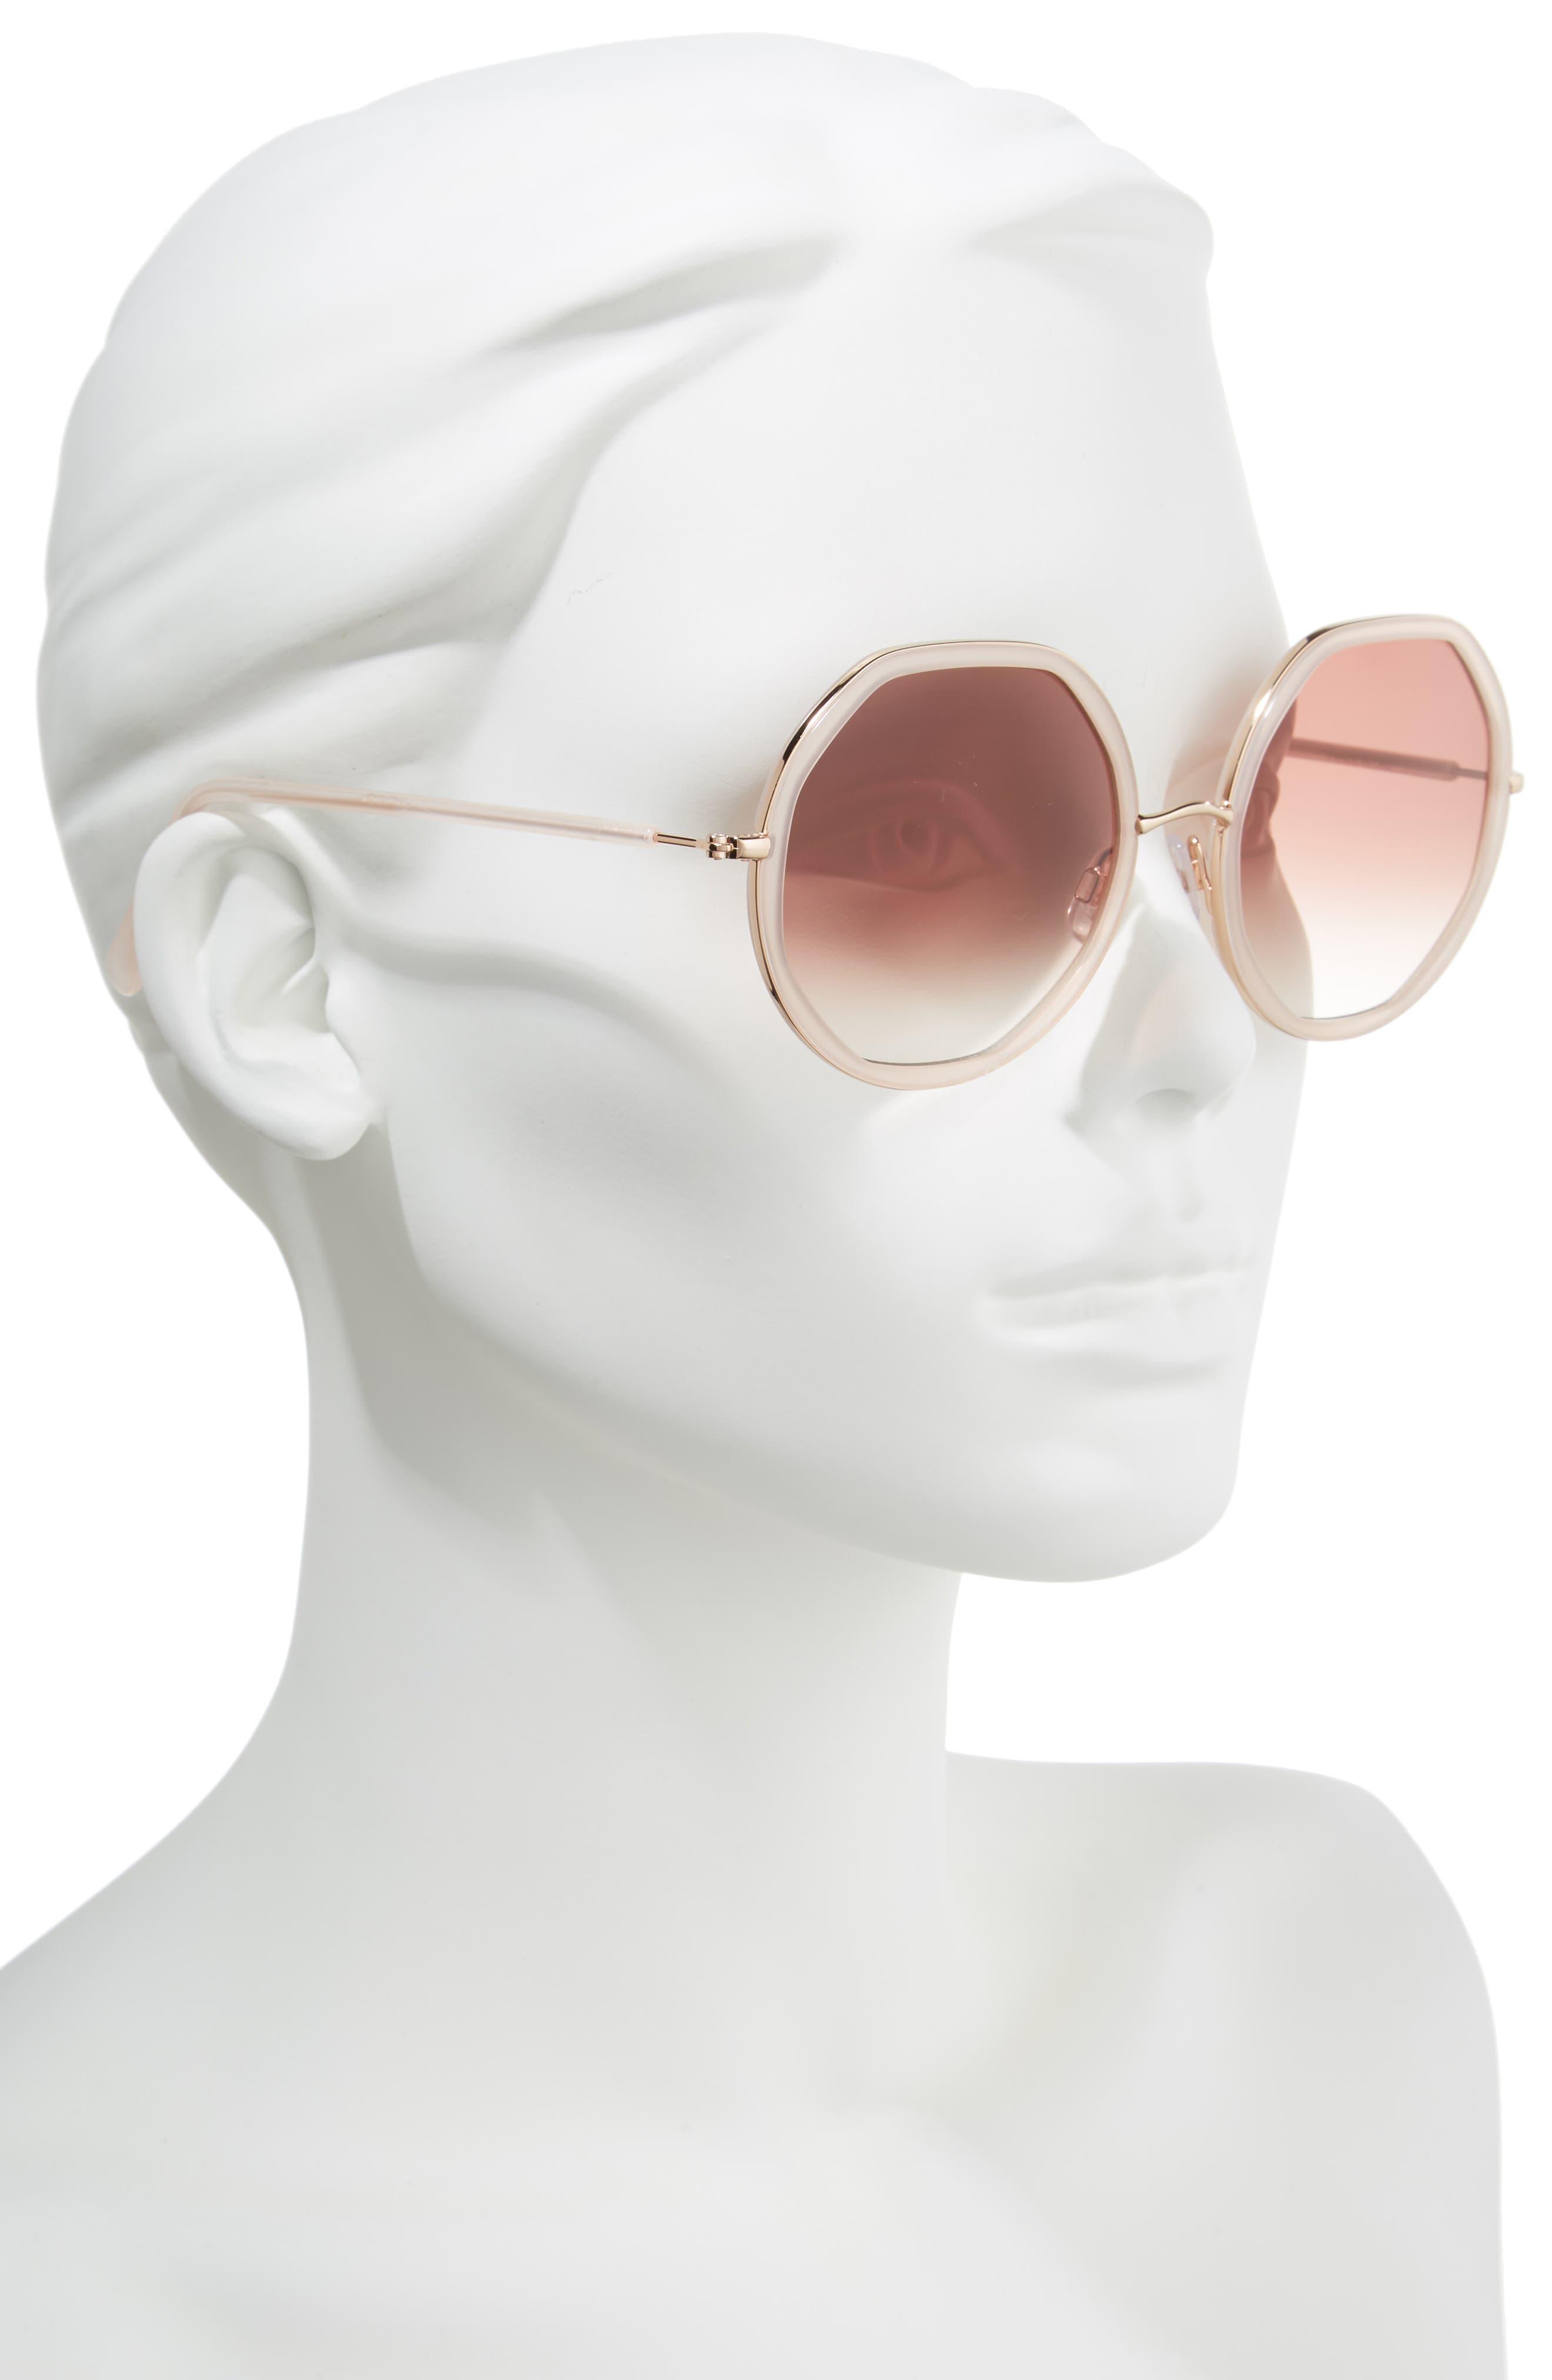 D'BLANC Sonic Bloom 58mm Sunglasses,                             Alternate thumbnail 2, color,                             OCTAGON BLUSH